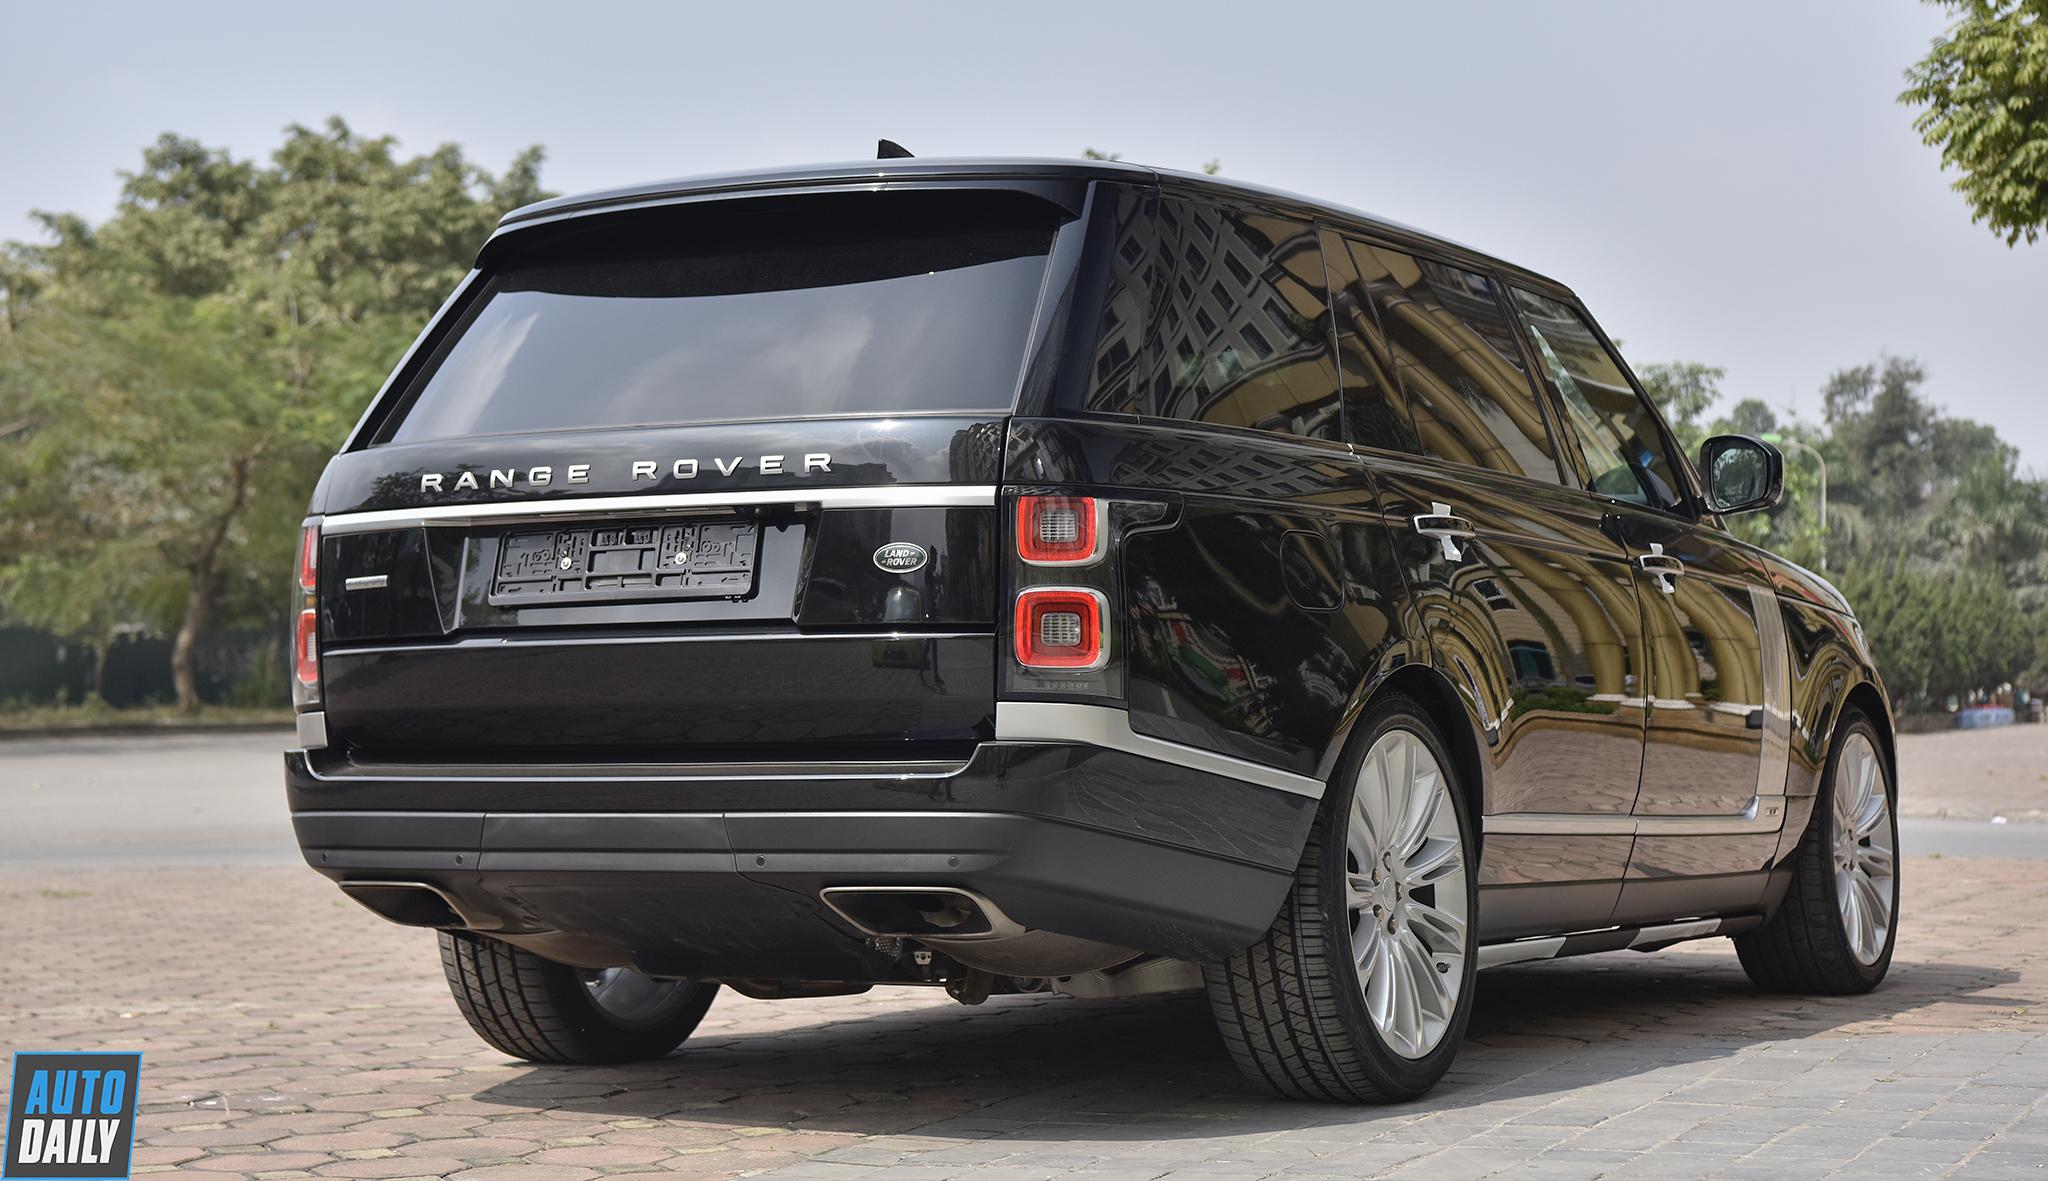 range-rover-autodaily28.jpg